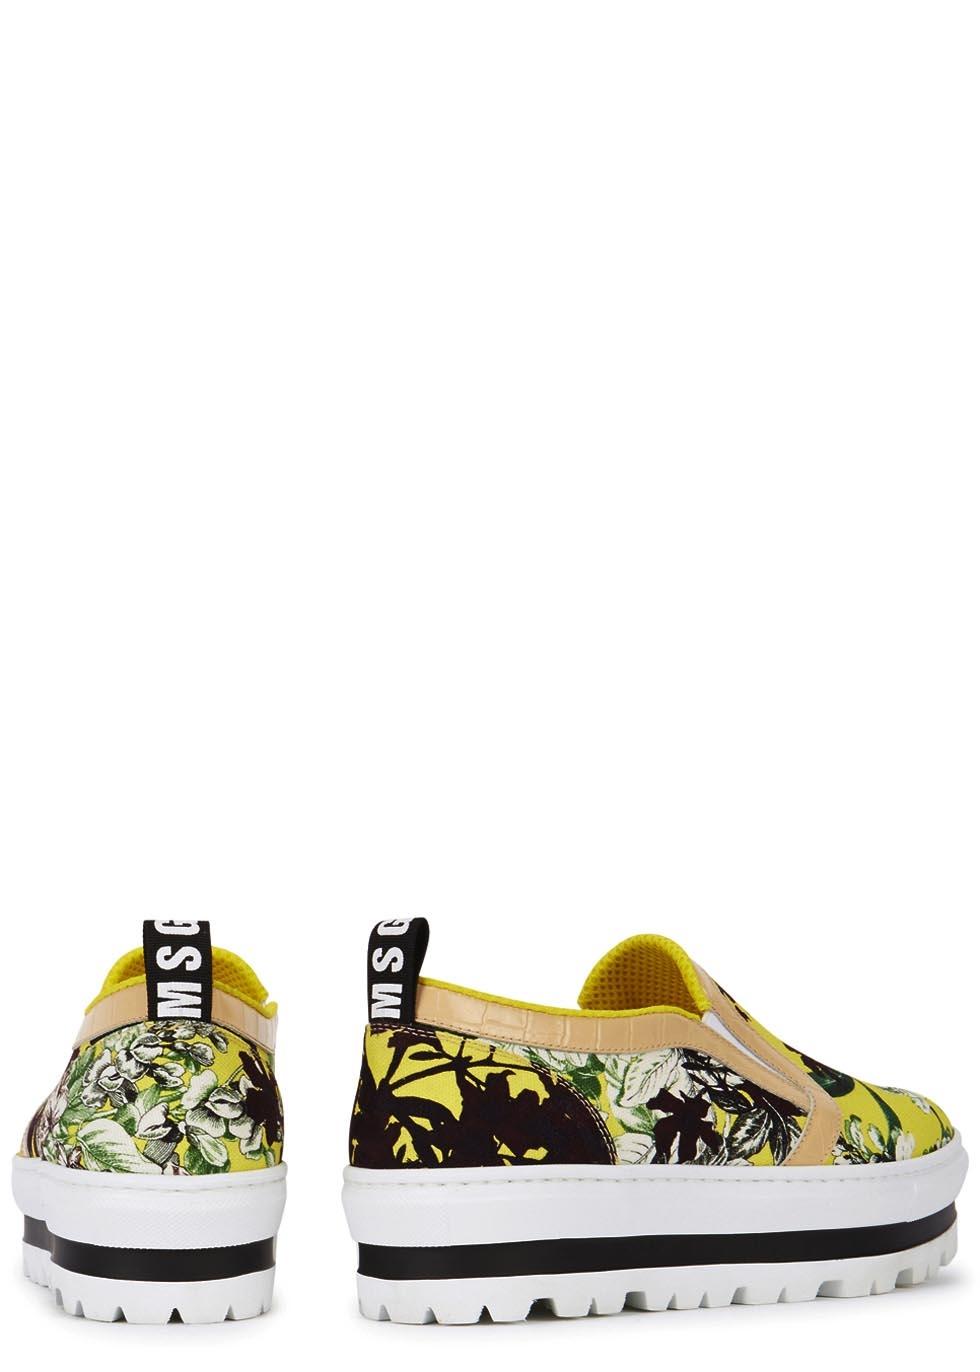 76eb7e9c98dd MSGM Floral Canvas Flatform Skate Shoes - Lyst